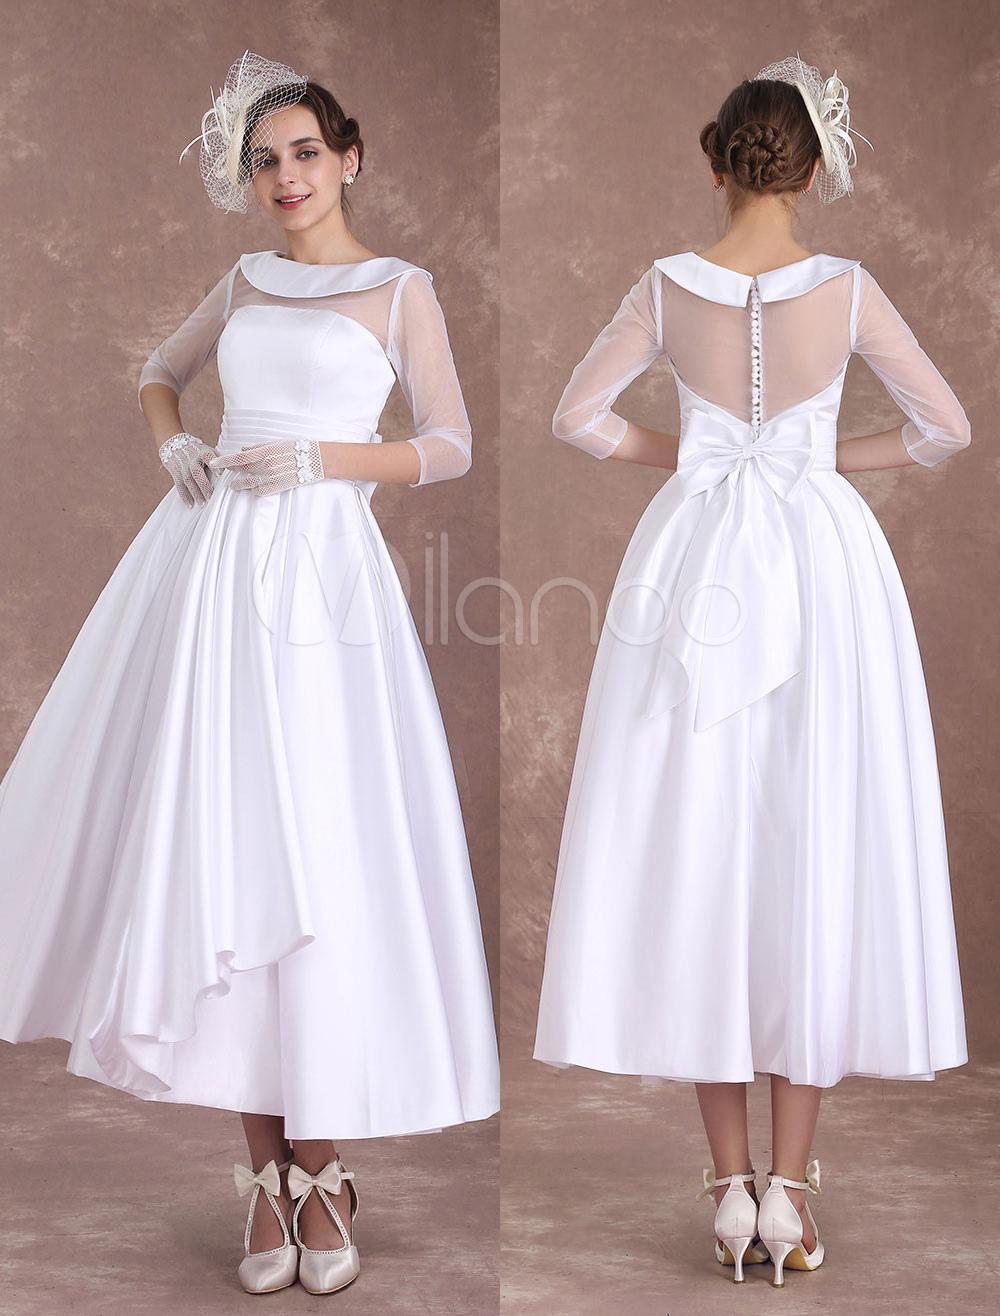 1950 S Vintage Wedding Dresses.White Wedding Dresses Short 1950 S Vintage Bridal Dress Satin Long Sleeve Pleated Illusion Tea Length Wedding Reception Dress Milanoo